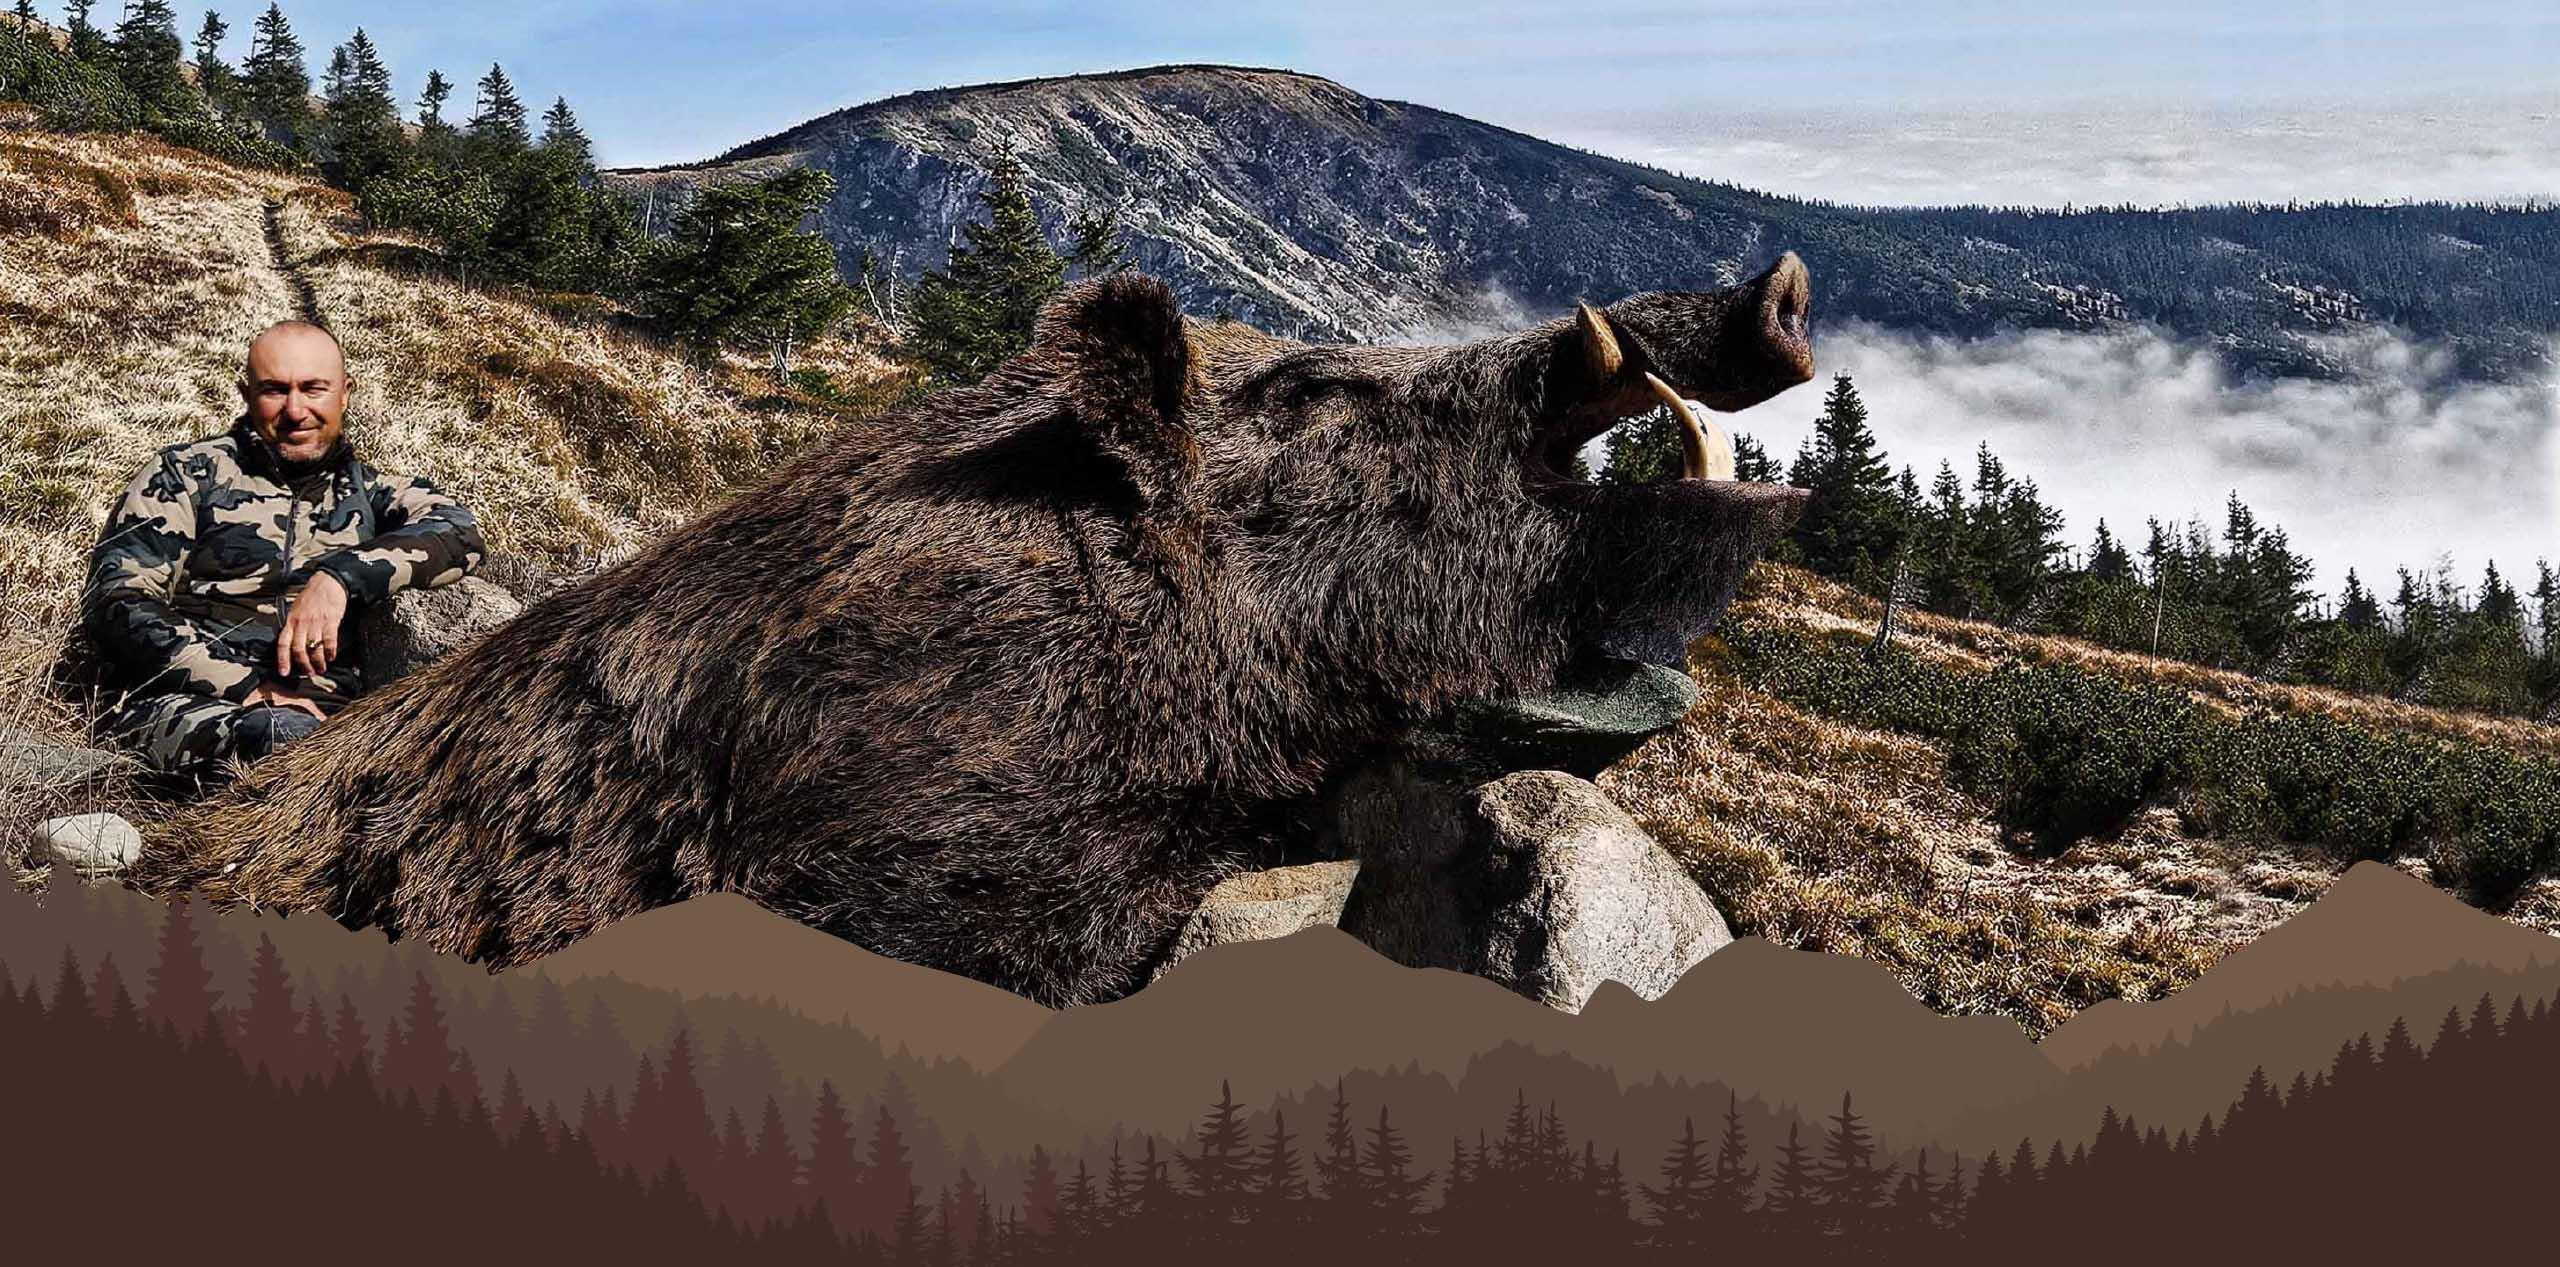 keiler jagd türkei, trofe hunting safaris, caza de jabali turquia, trofe hunting safaris, chasse au sanglier en turquie, trofe hunting safaris